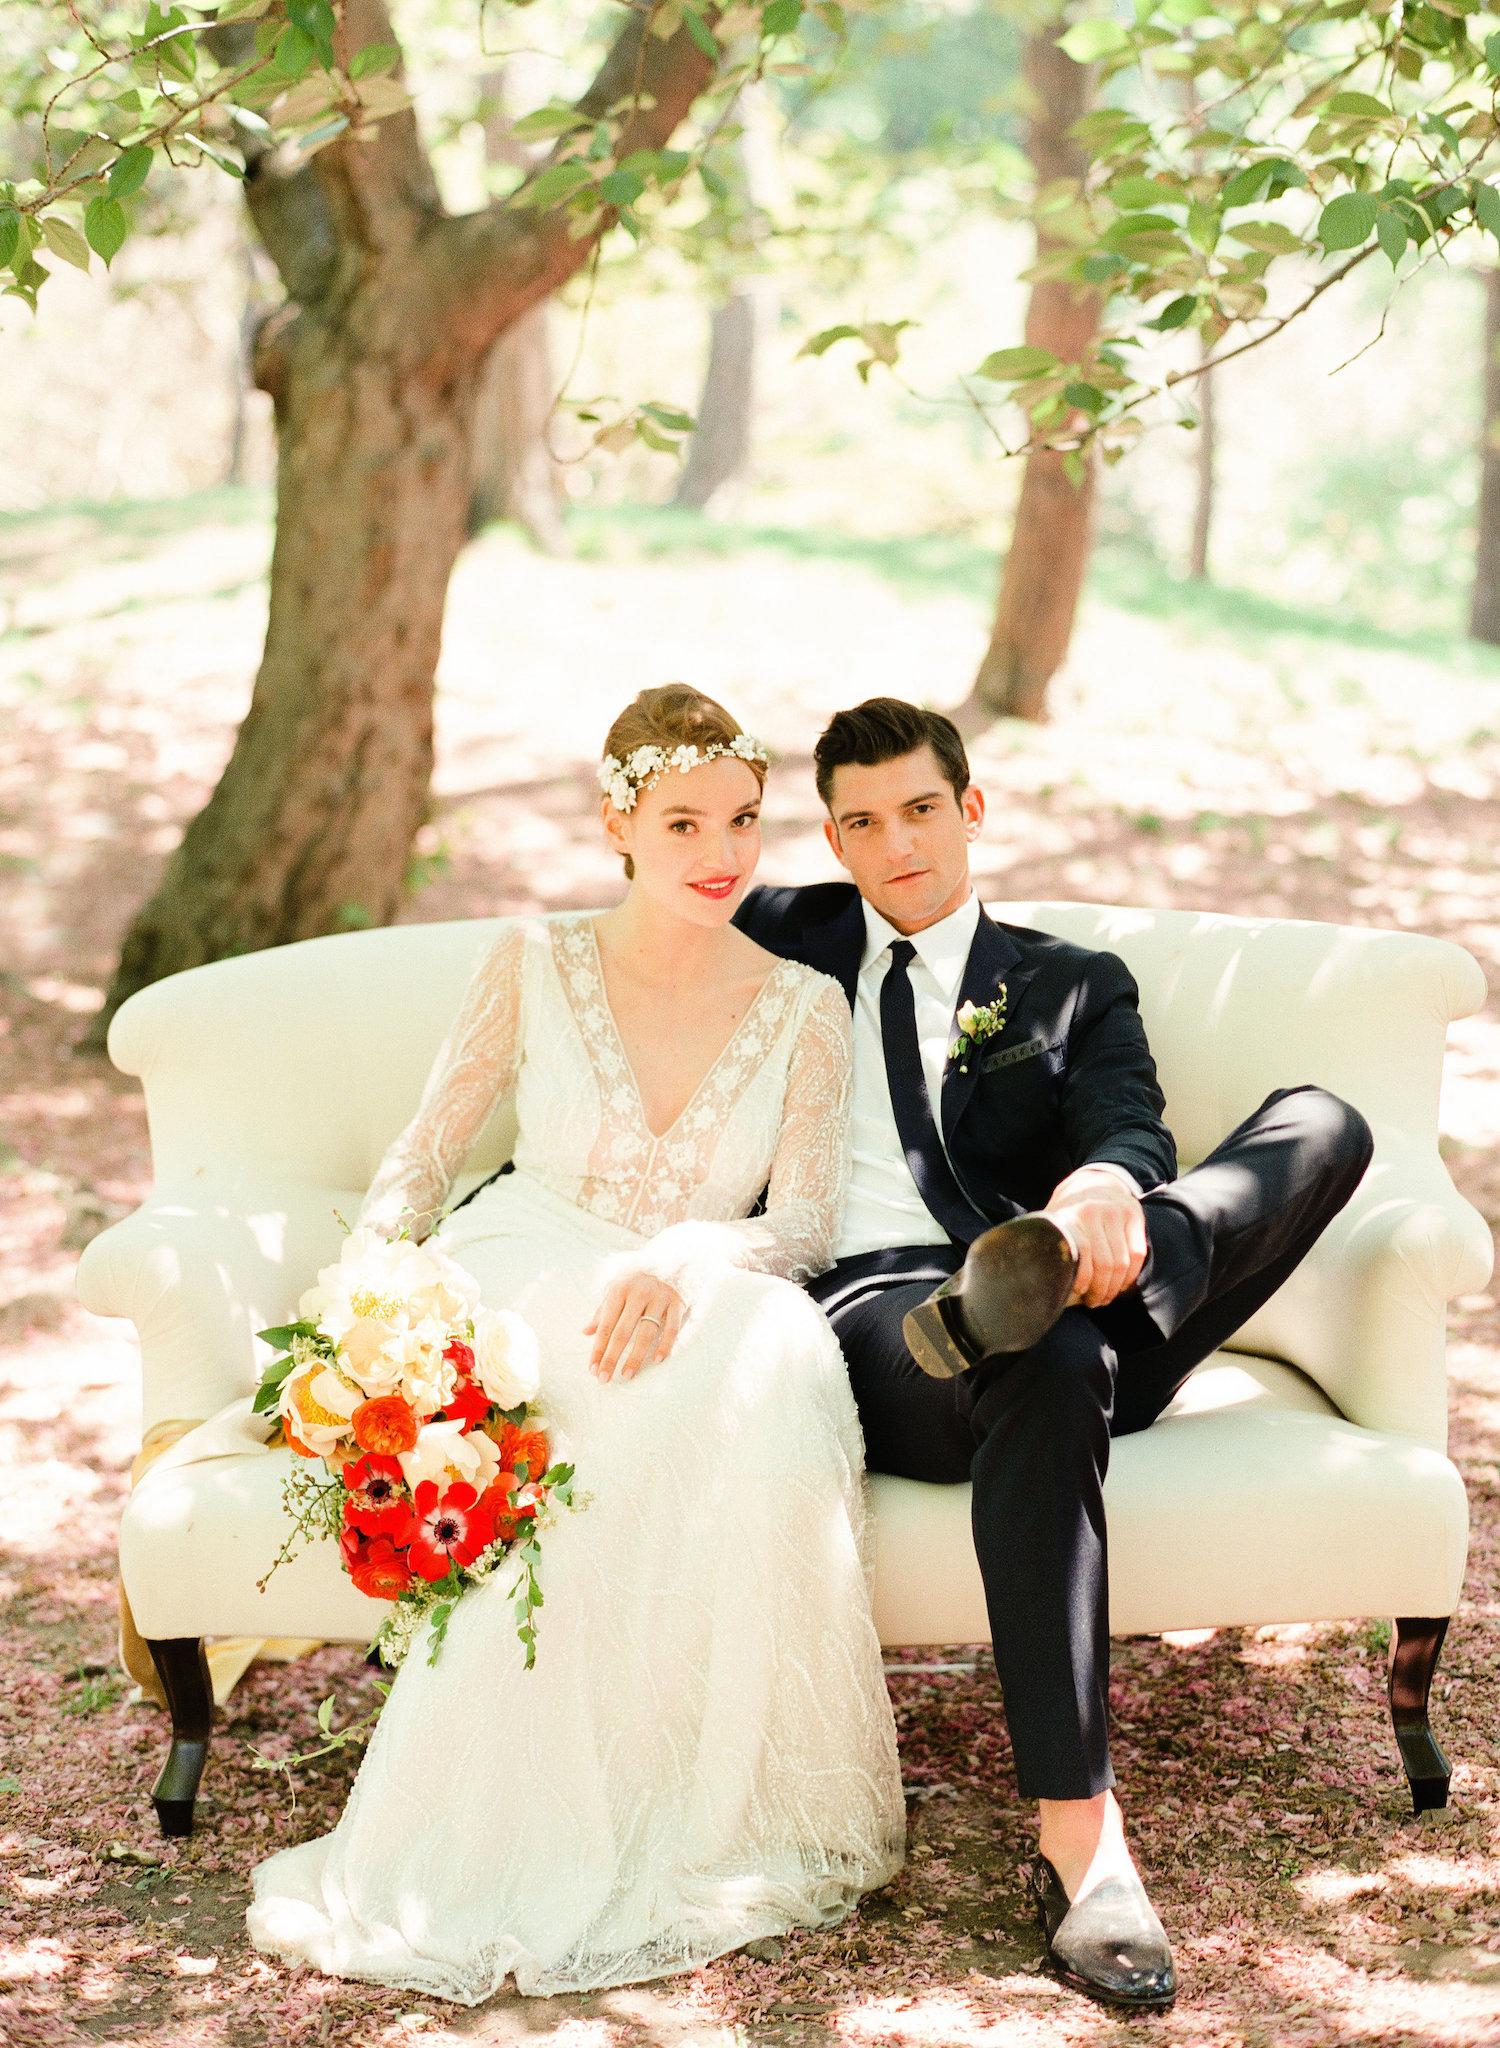 Morning Glow - Full Aperture Floral & Lindsay Madden Photography 31.jpeg